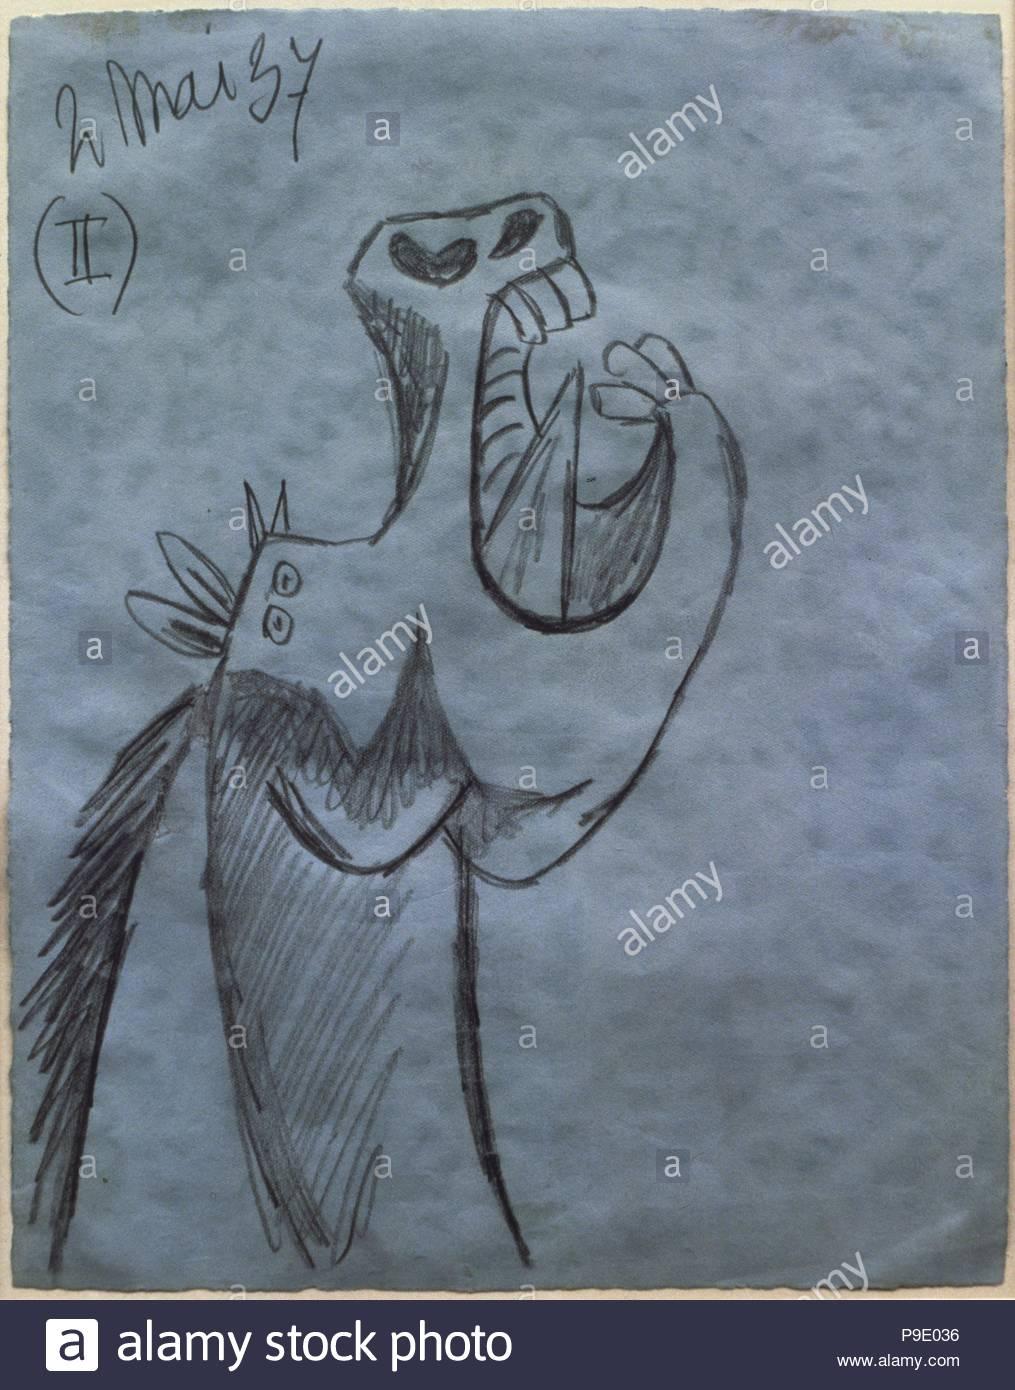 Pablo Picasso (Málaga, 1881-Mougins, 1973). Pintor español. Estudio para la cabeza del caballo (II) para 'El Guernica' (2 de mayo de 1937). Obra inspirada en un episodio de la guerra civil española. Grafito sobre papel azul (26.9 x 21 cm). Museo Reina Sofía. Madrid. España. Picasso. Study for the head of horse for 'Guernica'. Graphite on blue paper. - Stock Image